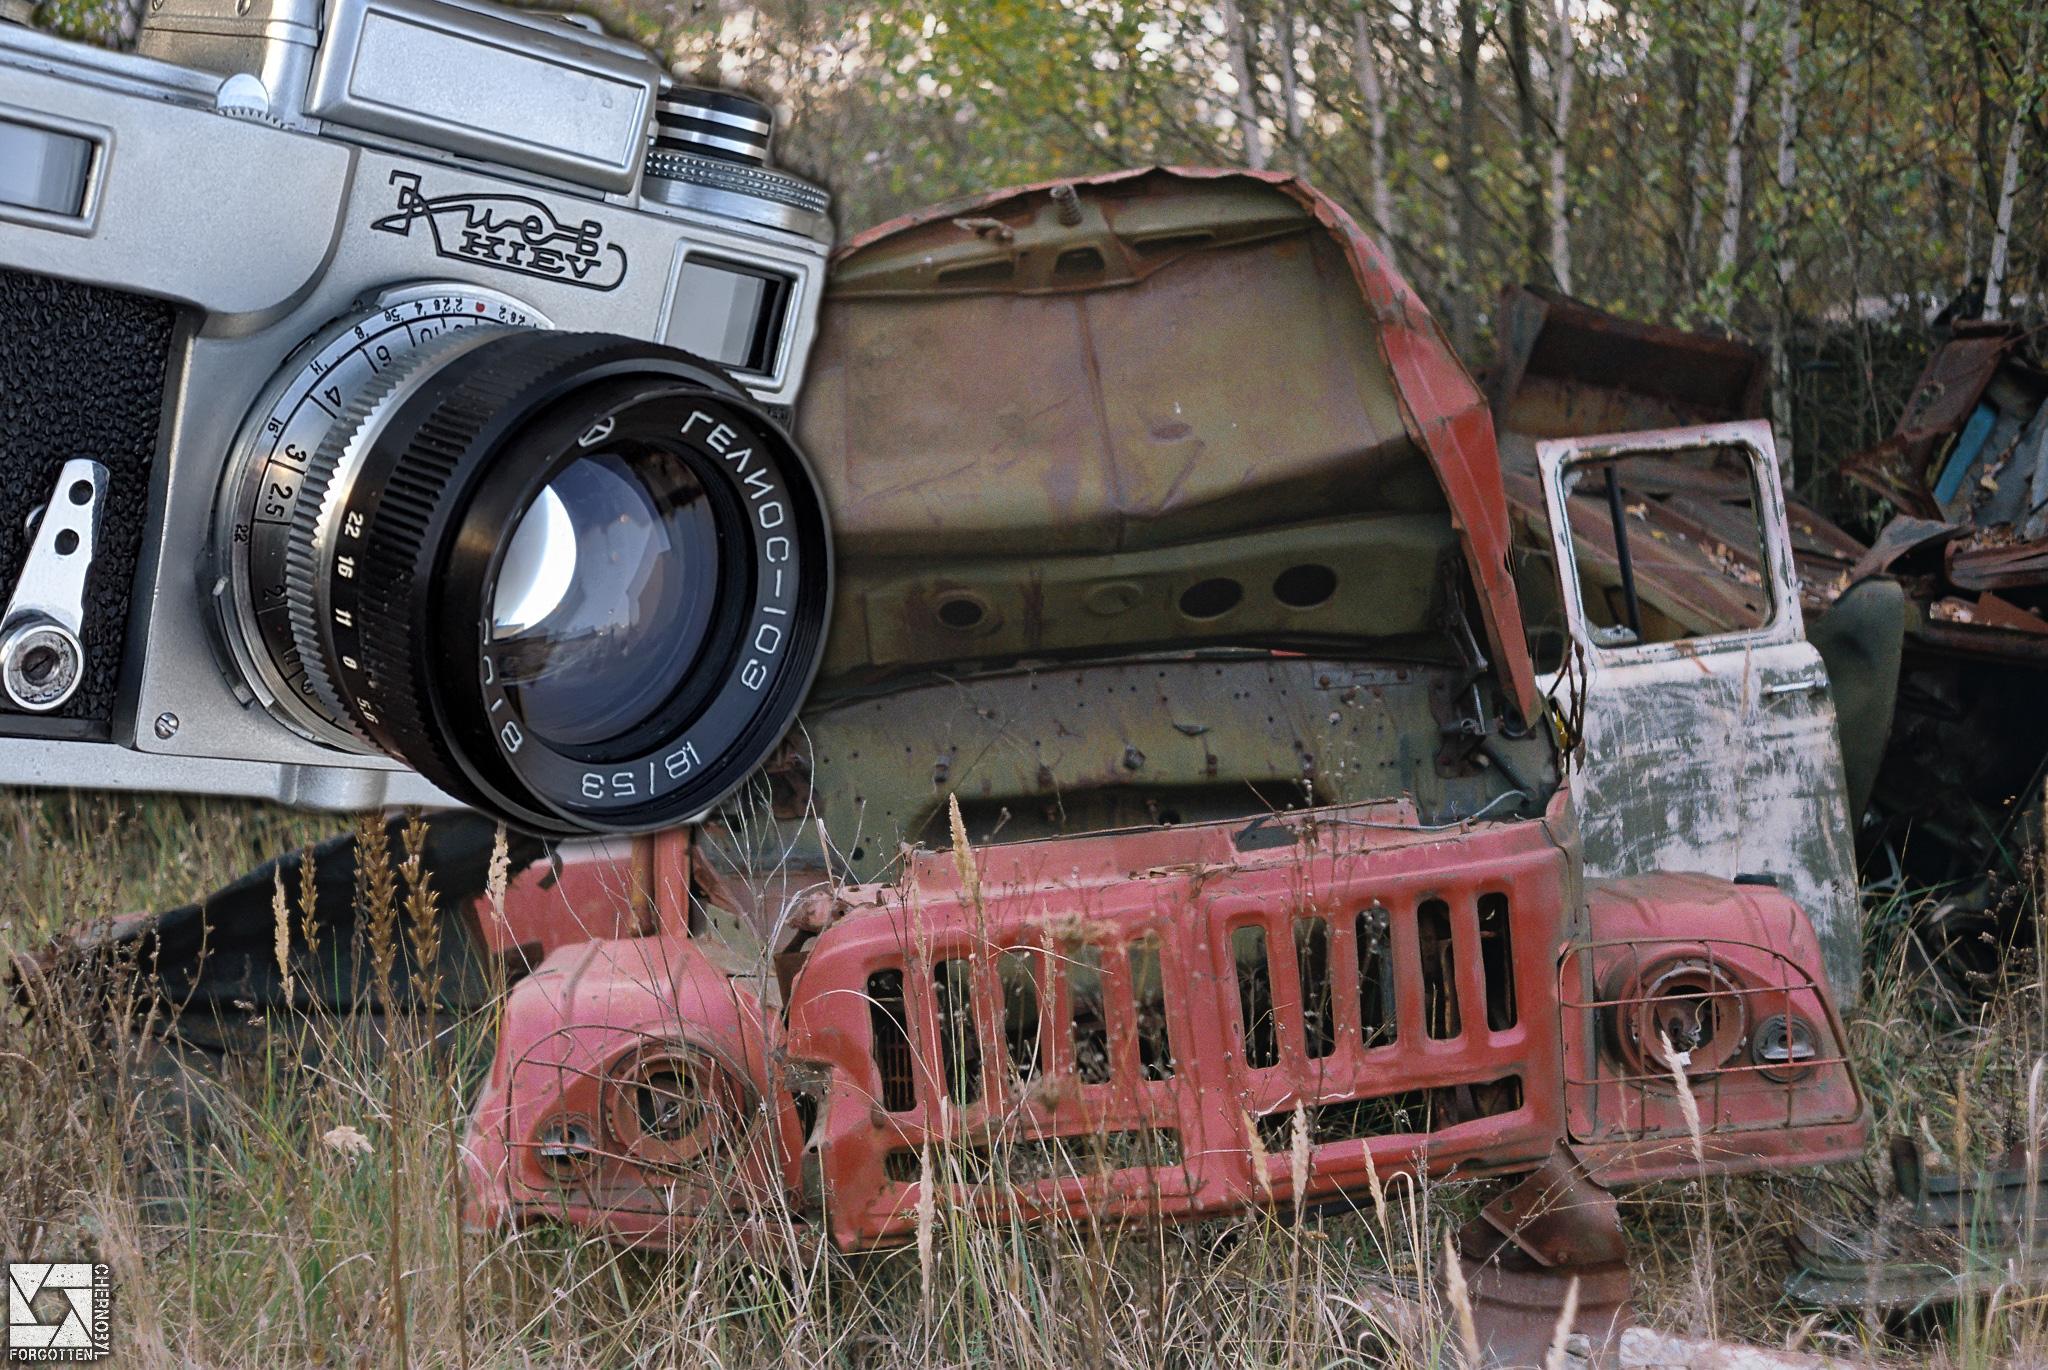 Analog Chernobyl Part 4 - Duga radar and Rossokha Vehicle Graveyard